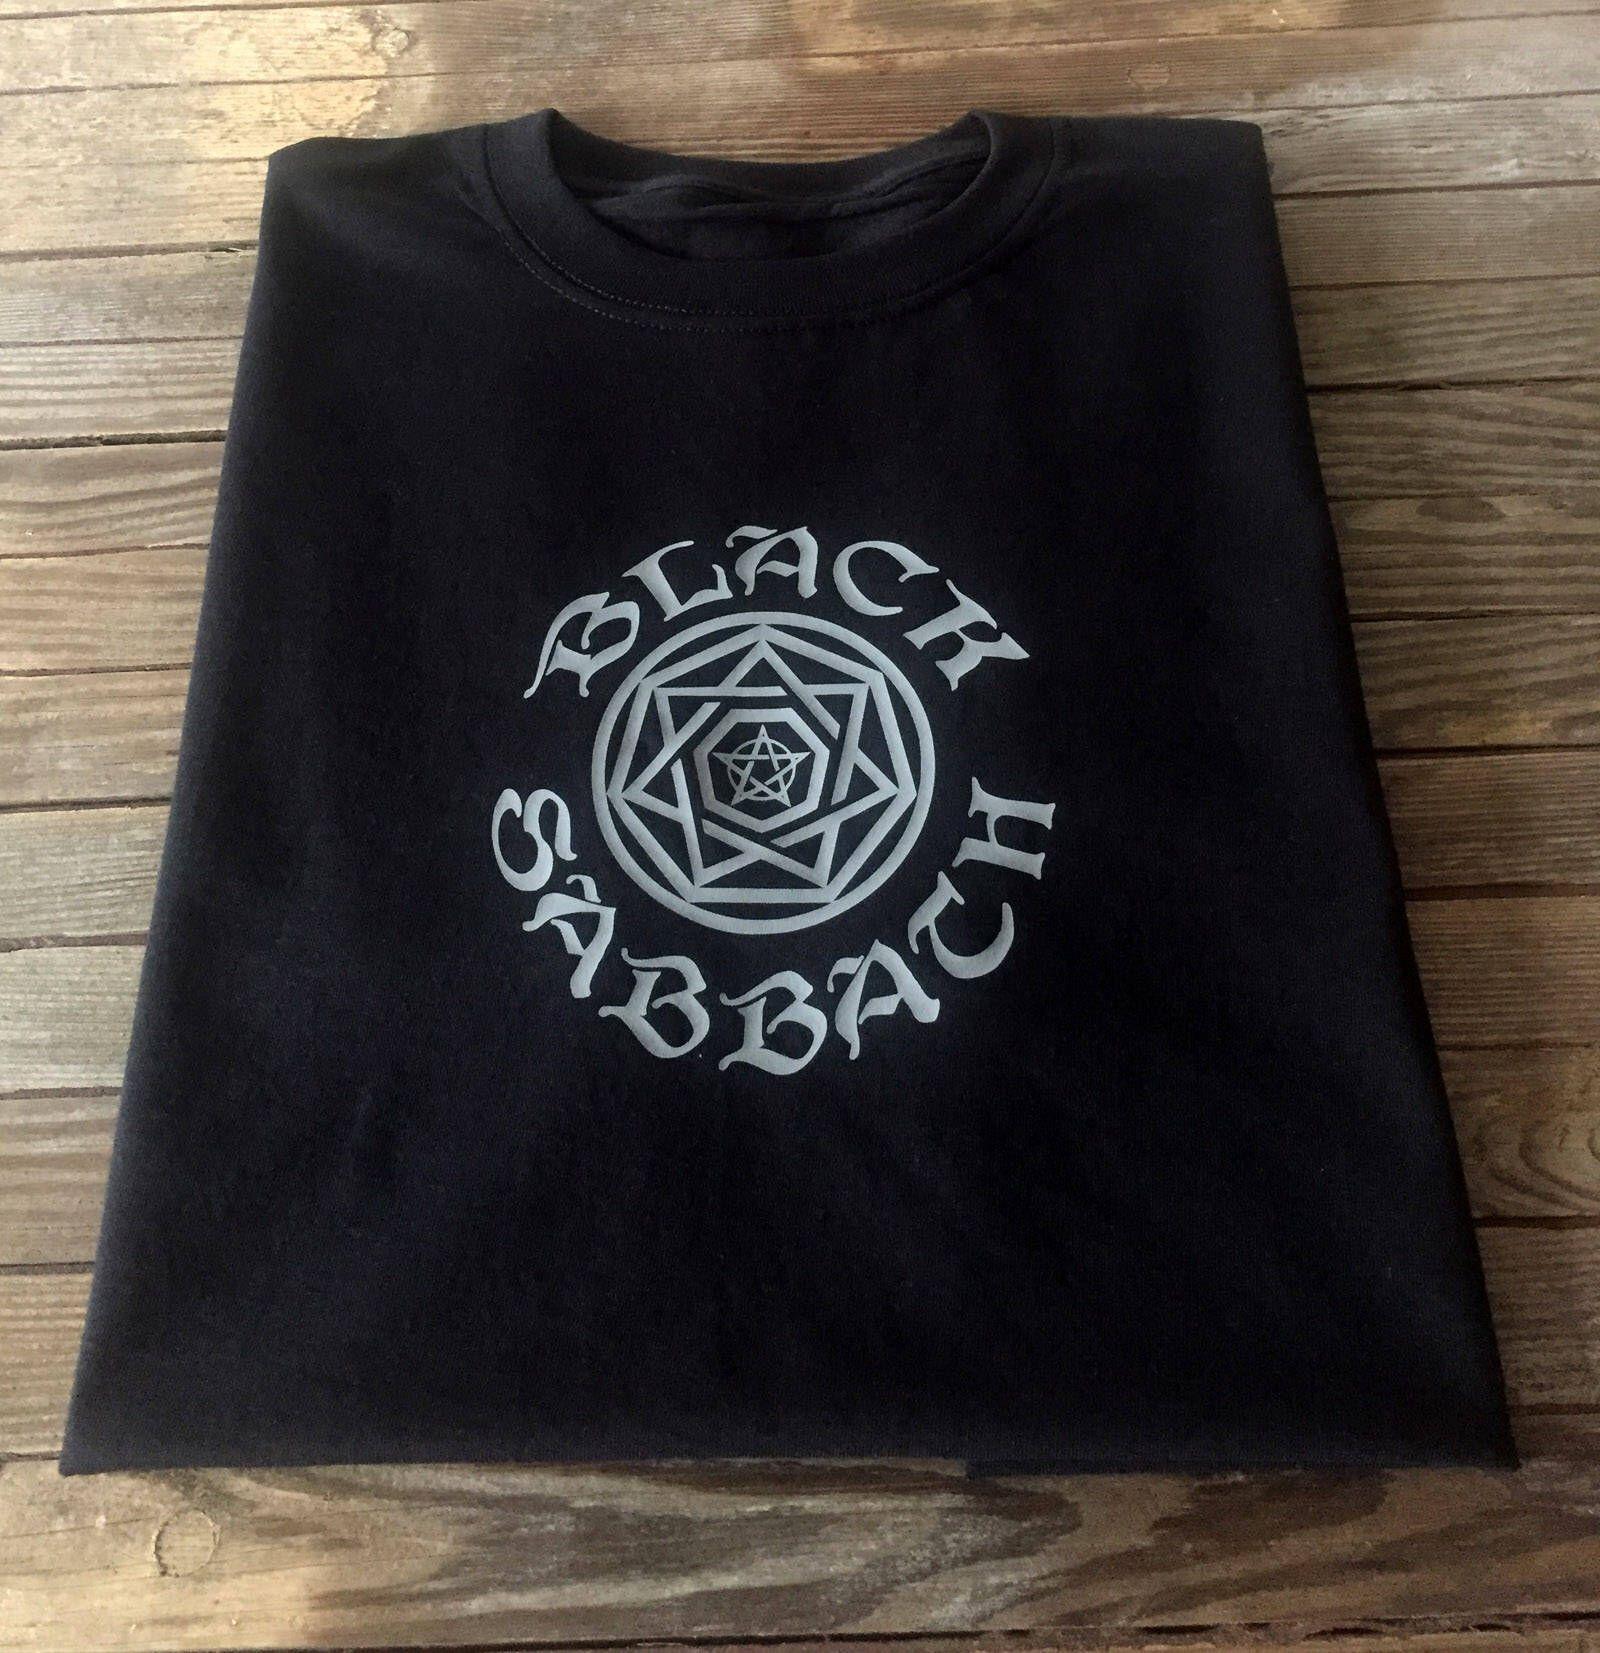 Black sabbath t shirt etsy - Black Sabbath T Shirt Ozzy Metal Wicca Style Pentagram Pentangle Rock Design